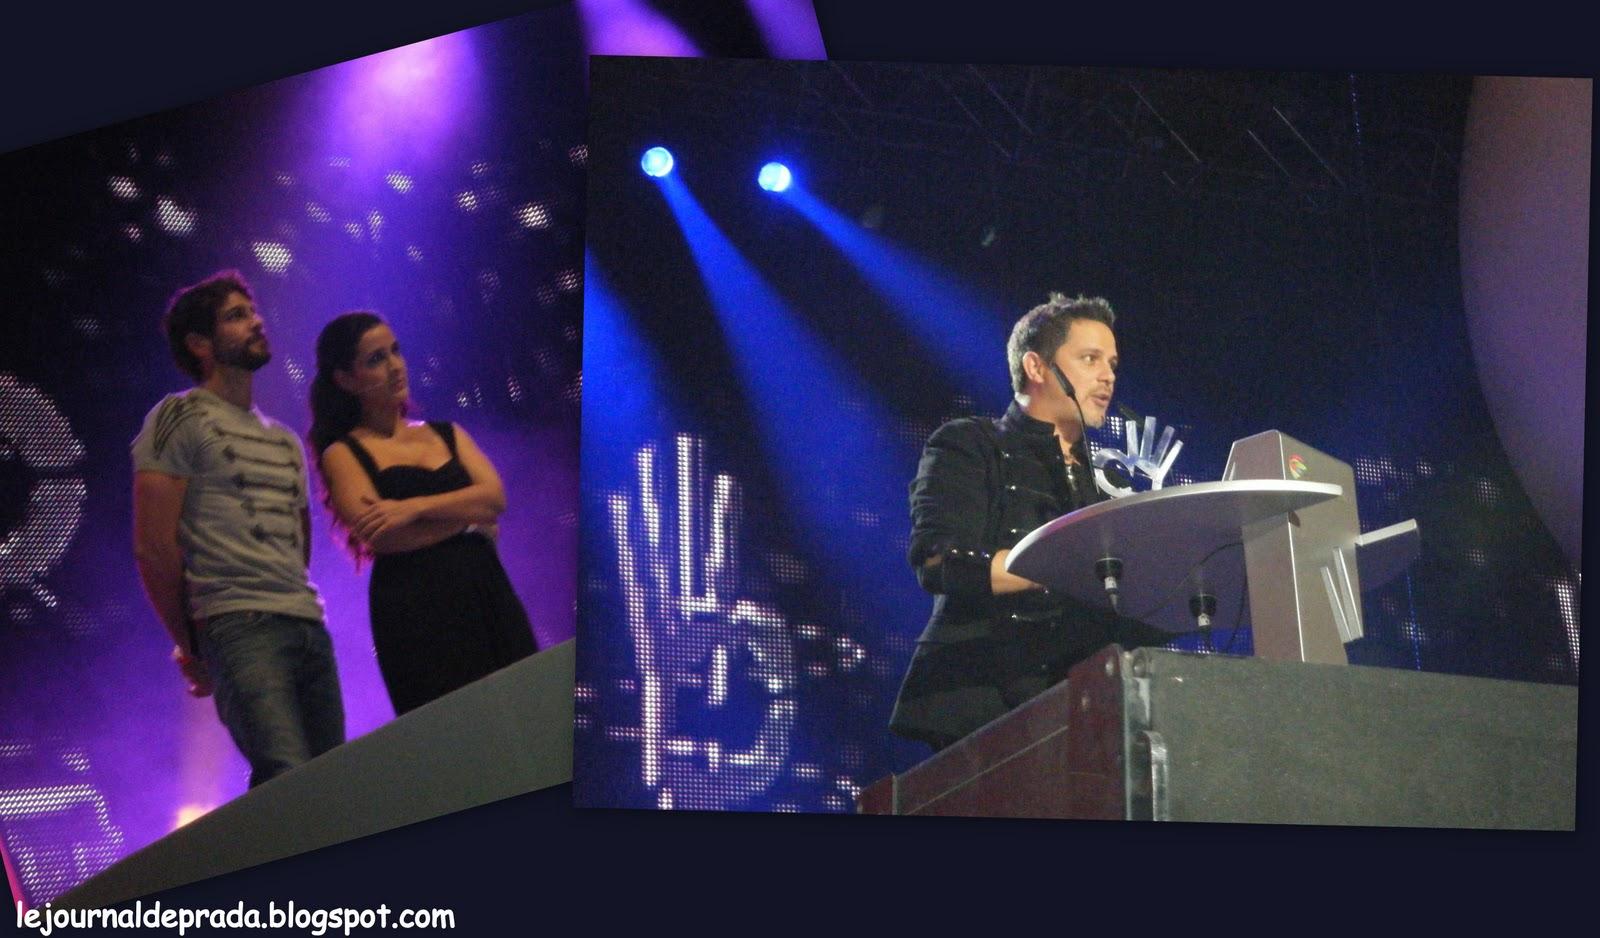 http://1.bp.blogspot.com/_bn9i-ElGTLs/TRD4AWPjuXI/AAAAAAAAANI/Y4q64N9E3XM/s1600/gala+premios+40+pp1.jpg